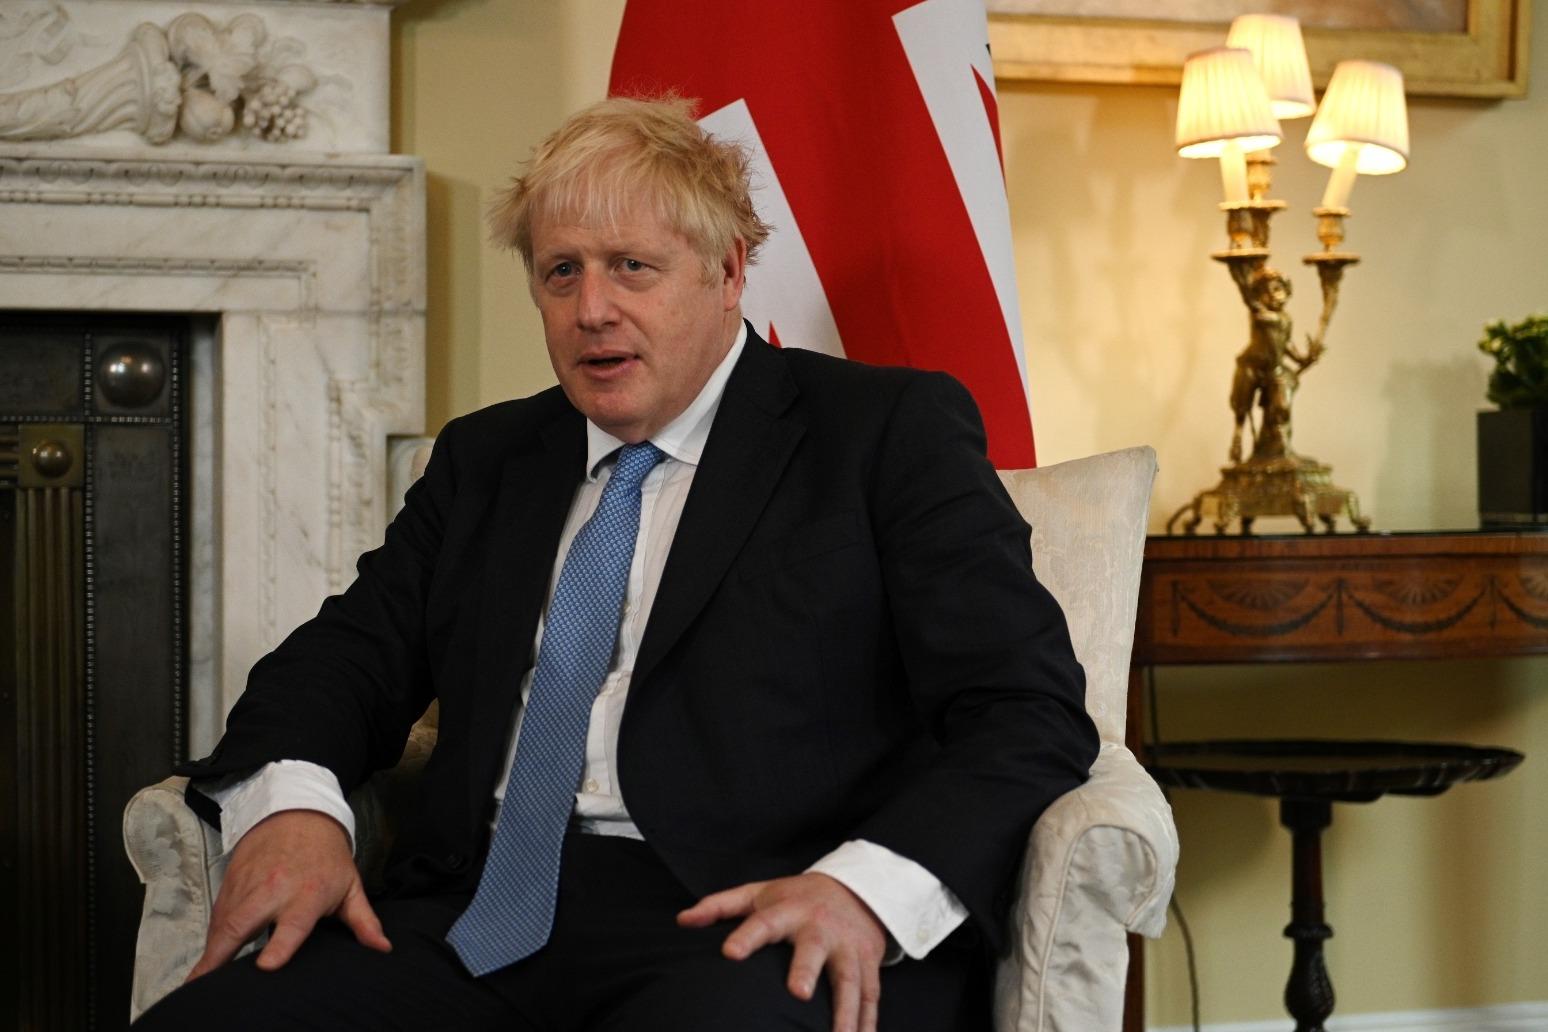 9/11 attackers failed to undermine freedom and democracy, says Johnson